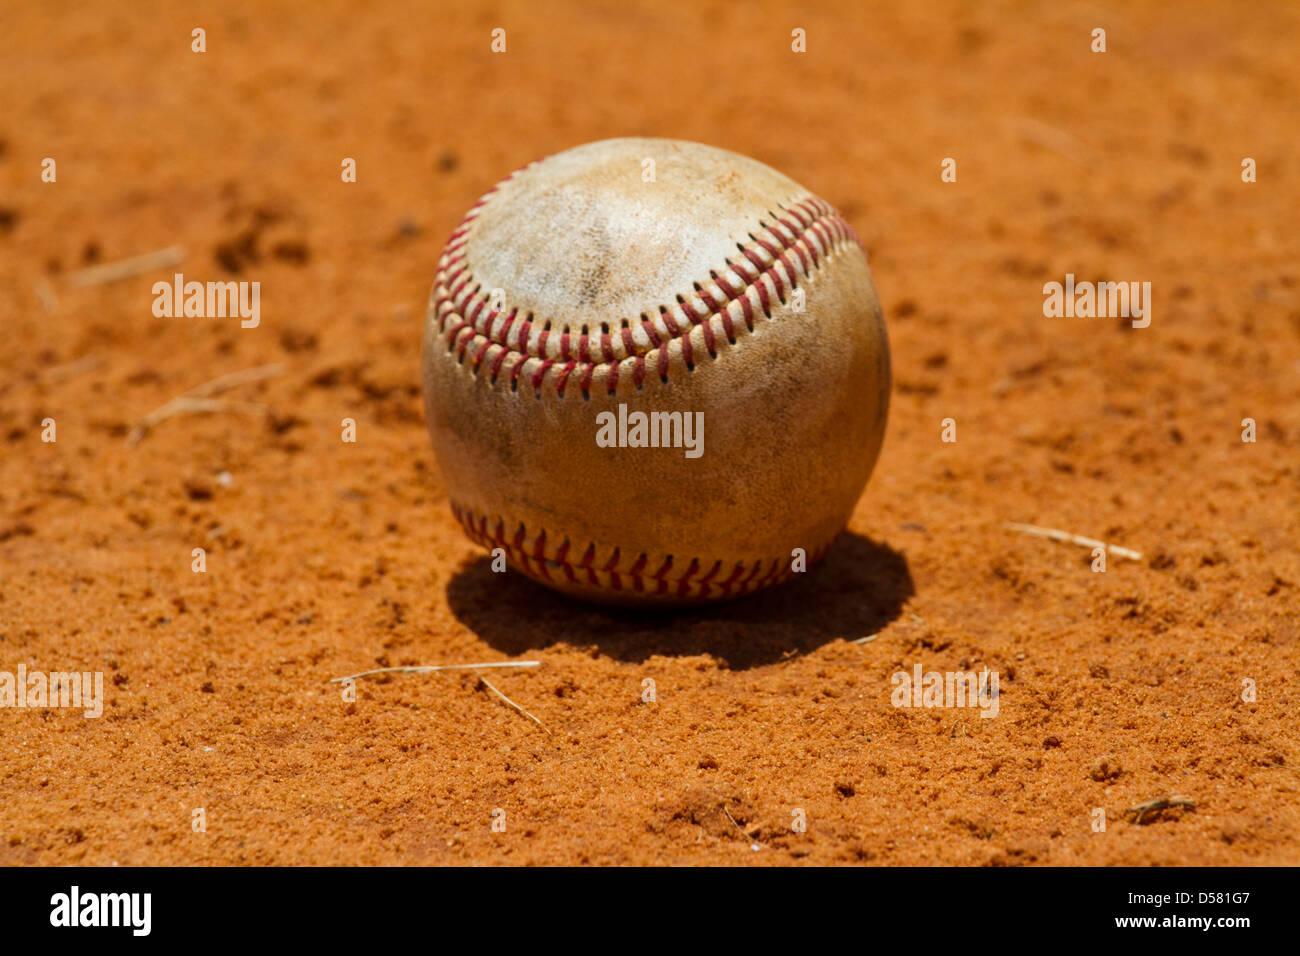 Baseball lying in a field - Stock Image